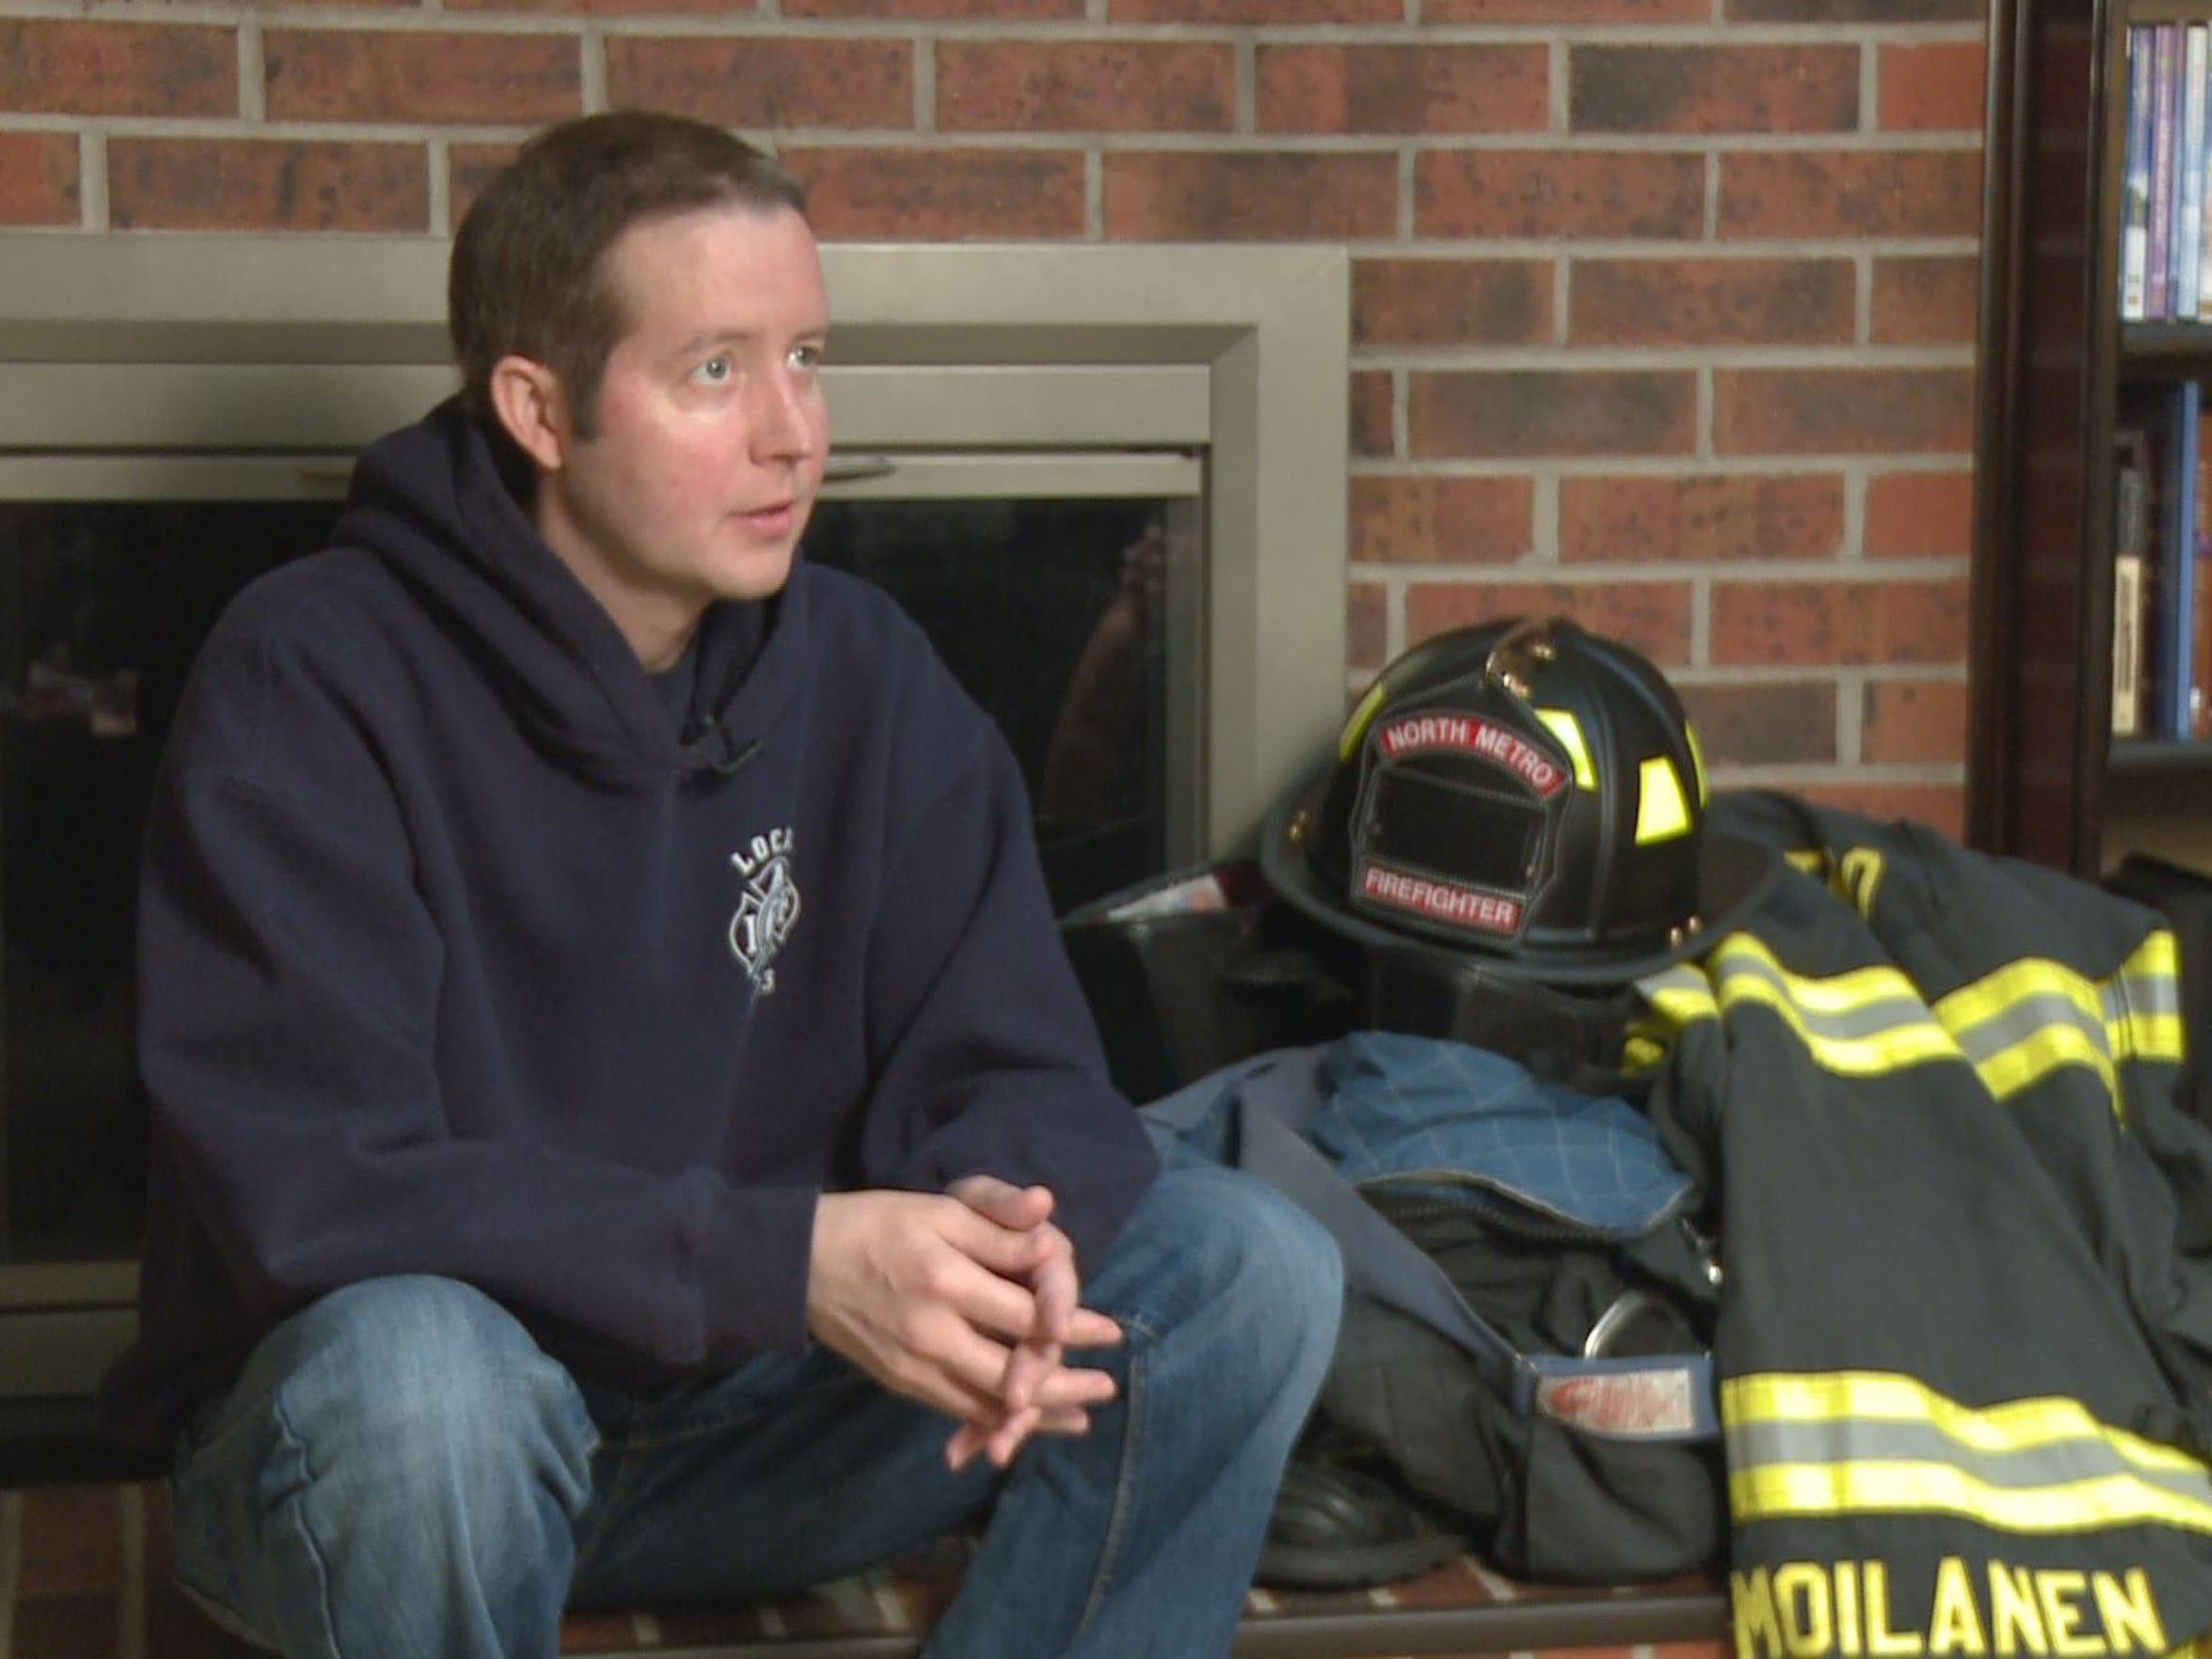 North Metro Firefighter Craig Moilanen